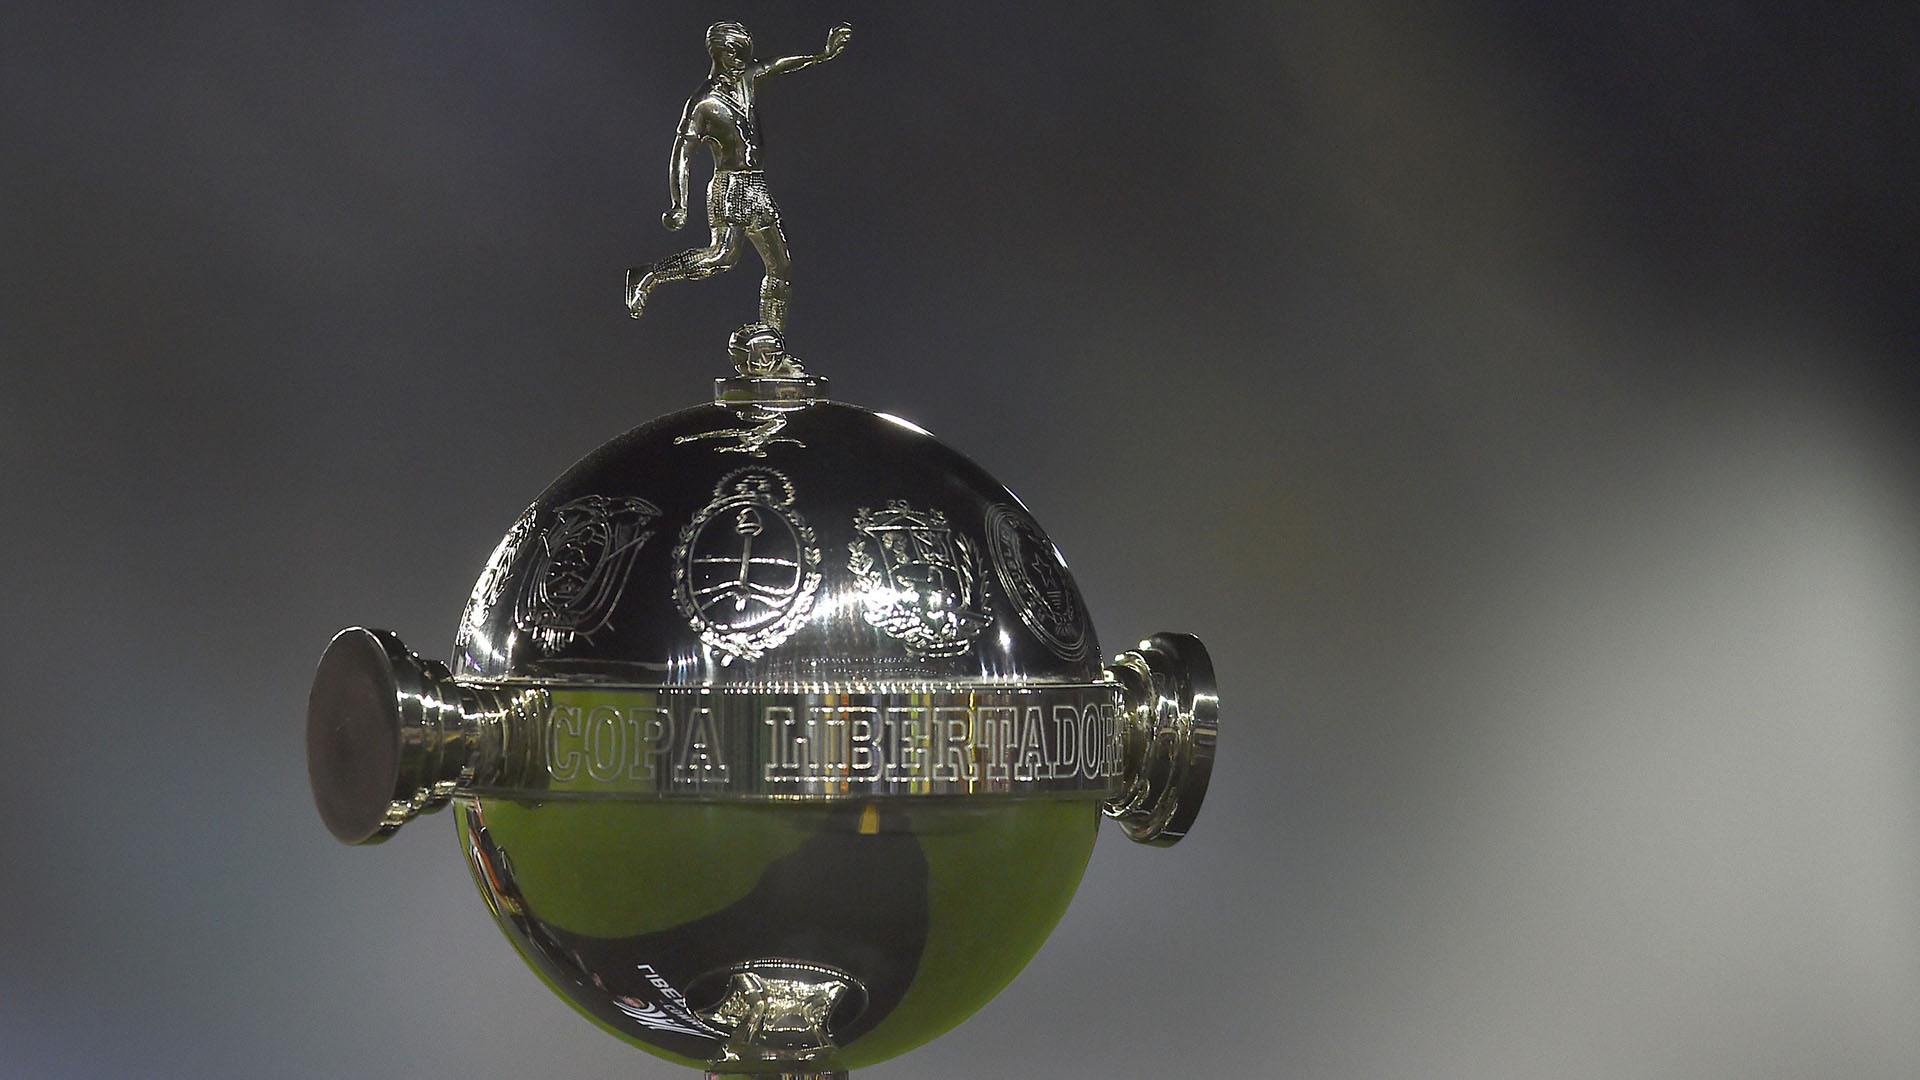 La Copa Libertadores finalizará en diciembre (Getty Images)